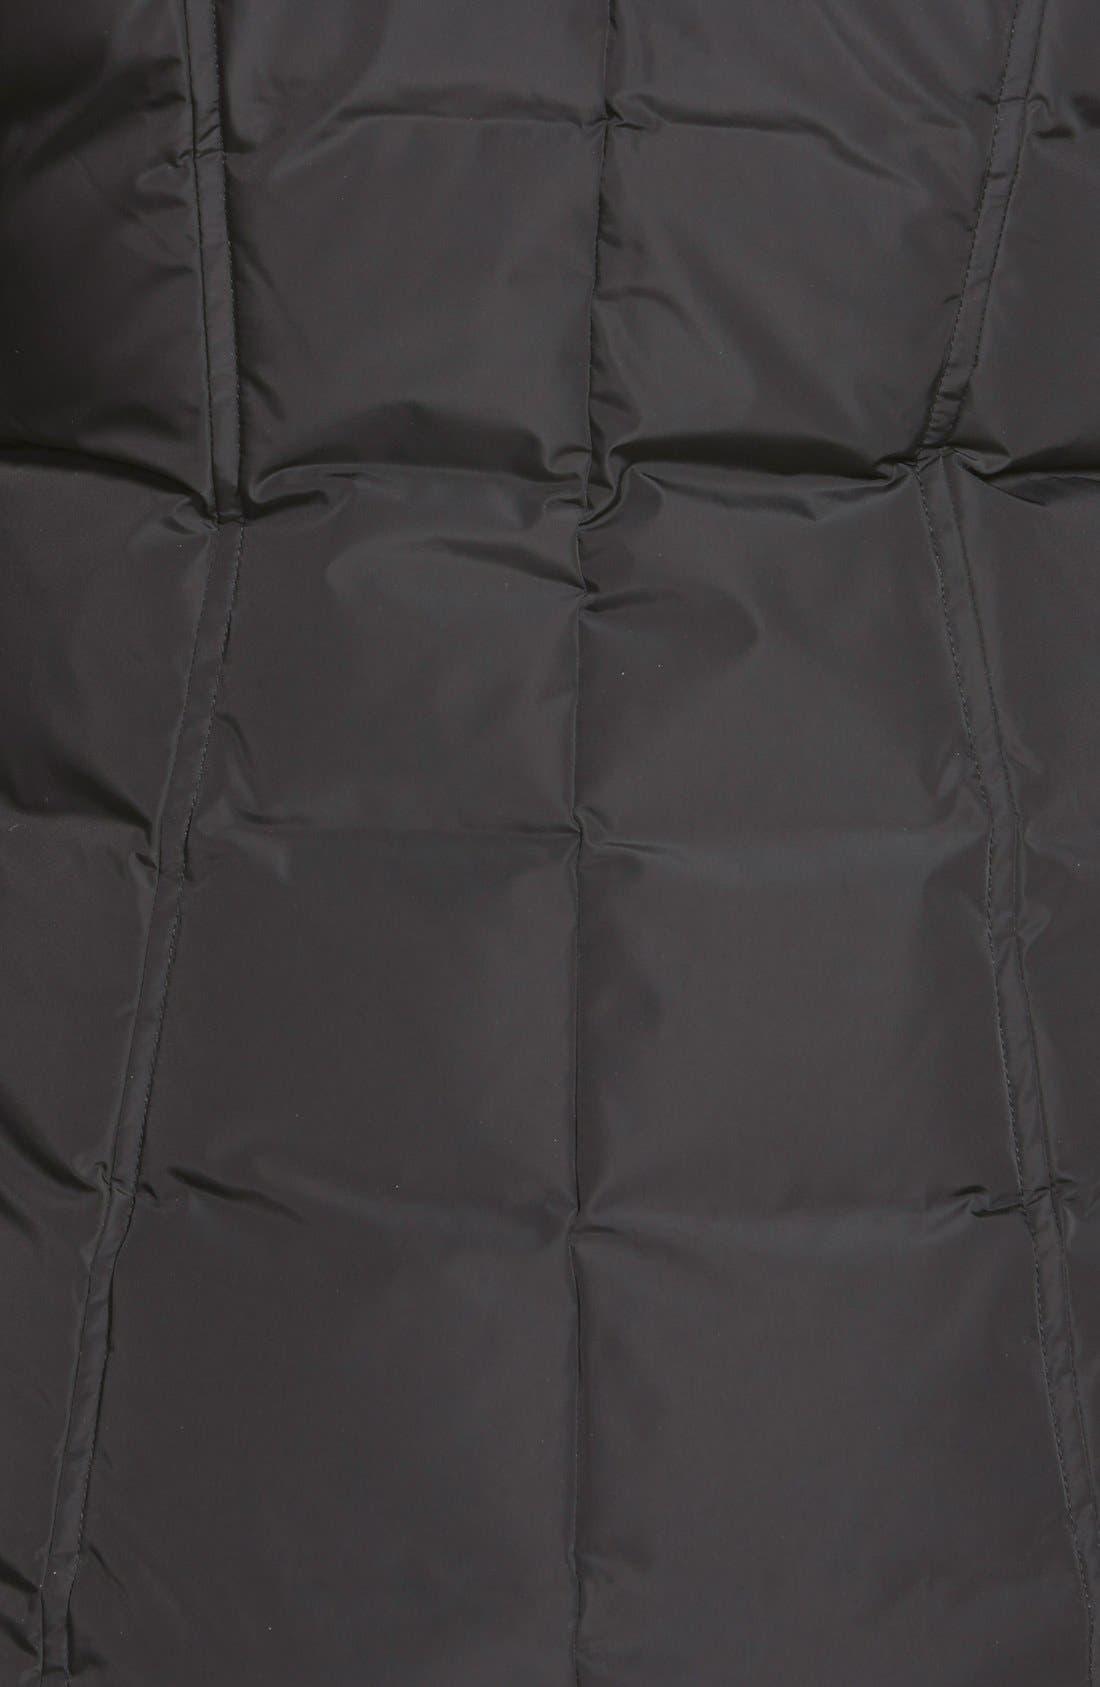 MACKAGE, Hooded Down Parka with Inset Bib & Genuine Fox Fur Trim, Alternate thumbnail 8, color, 001